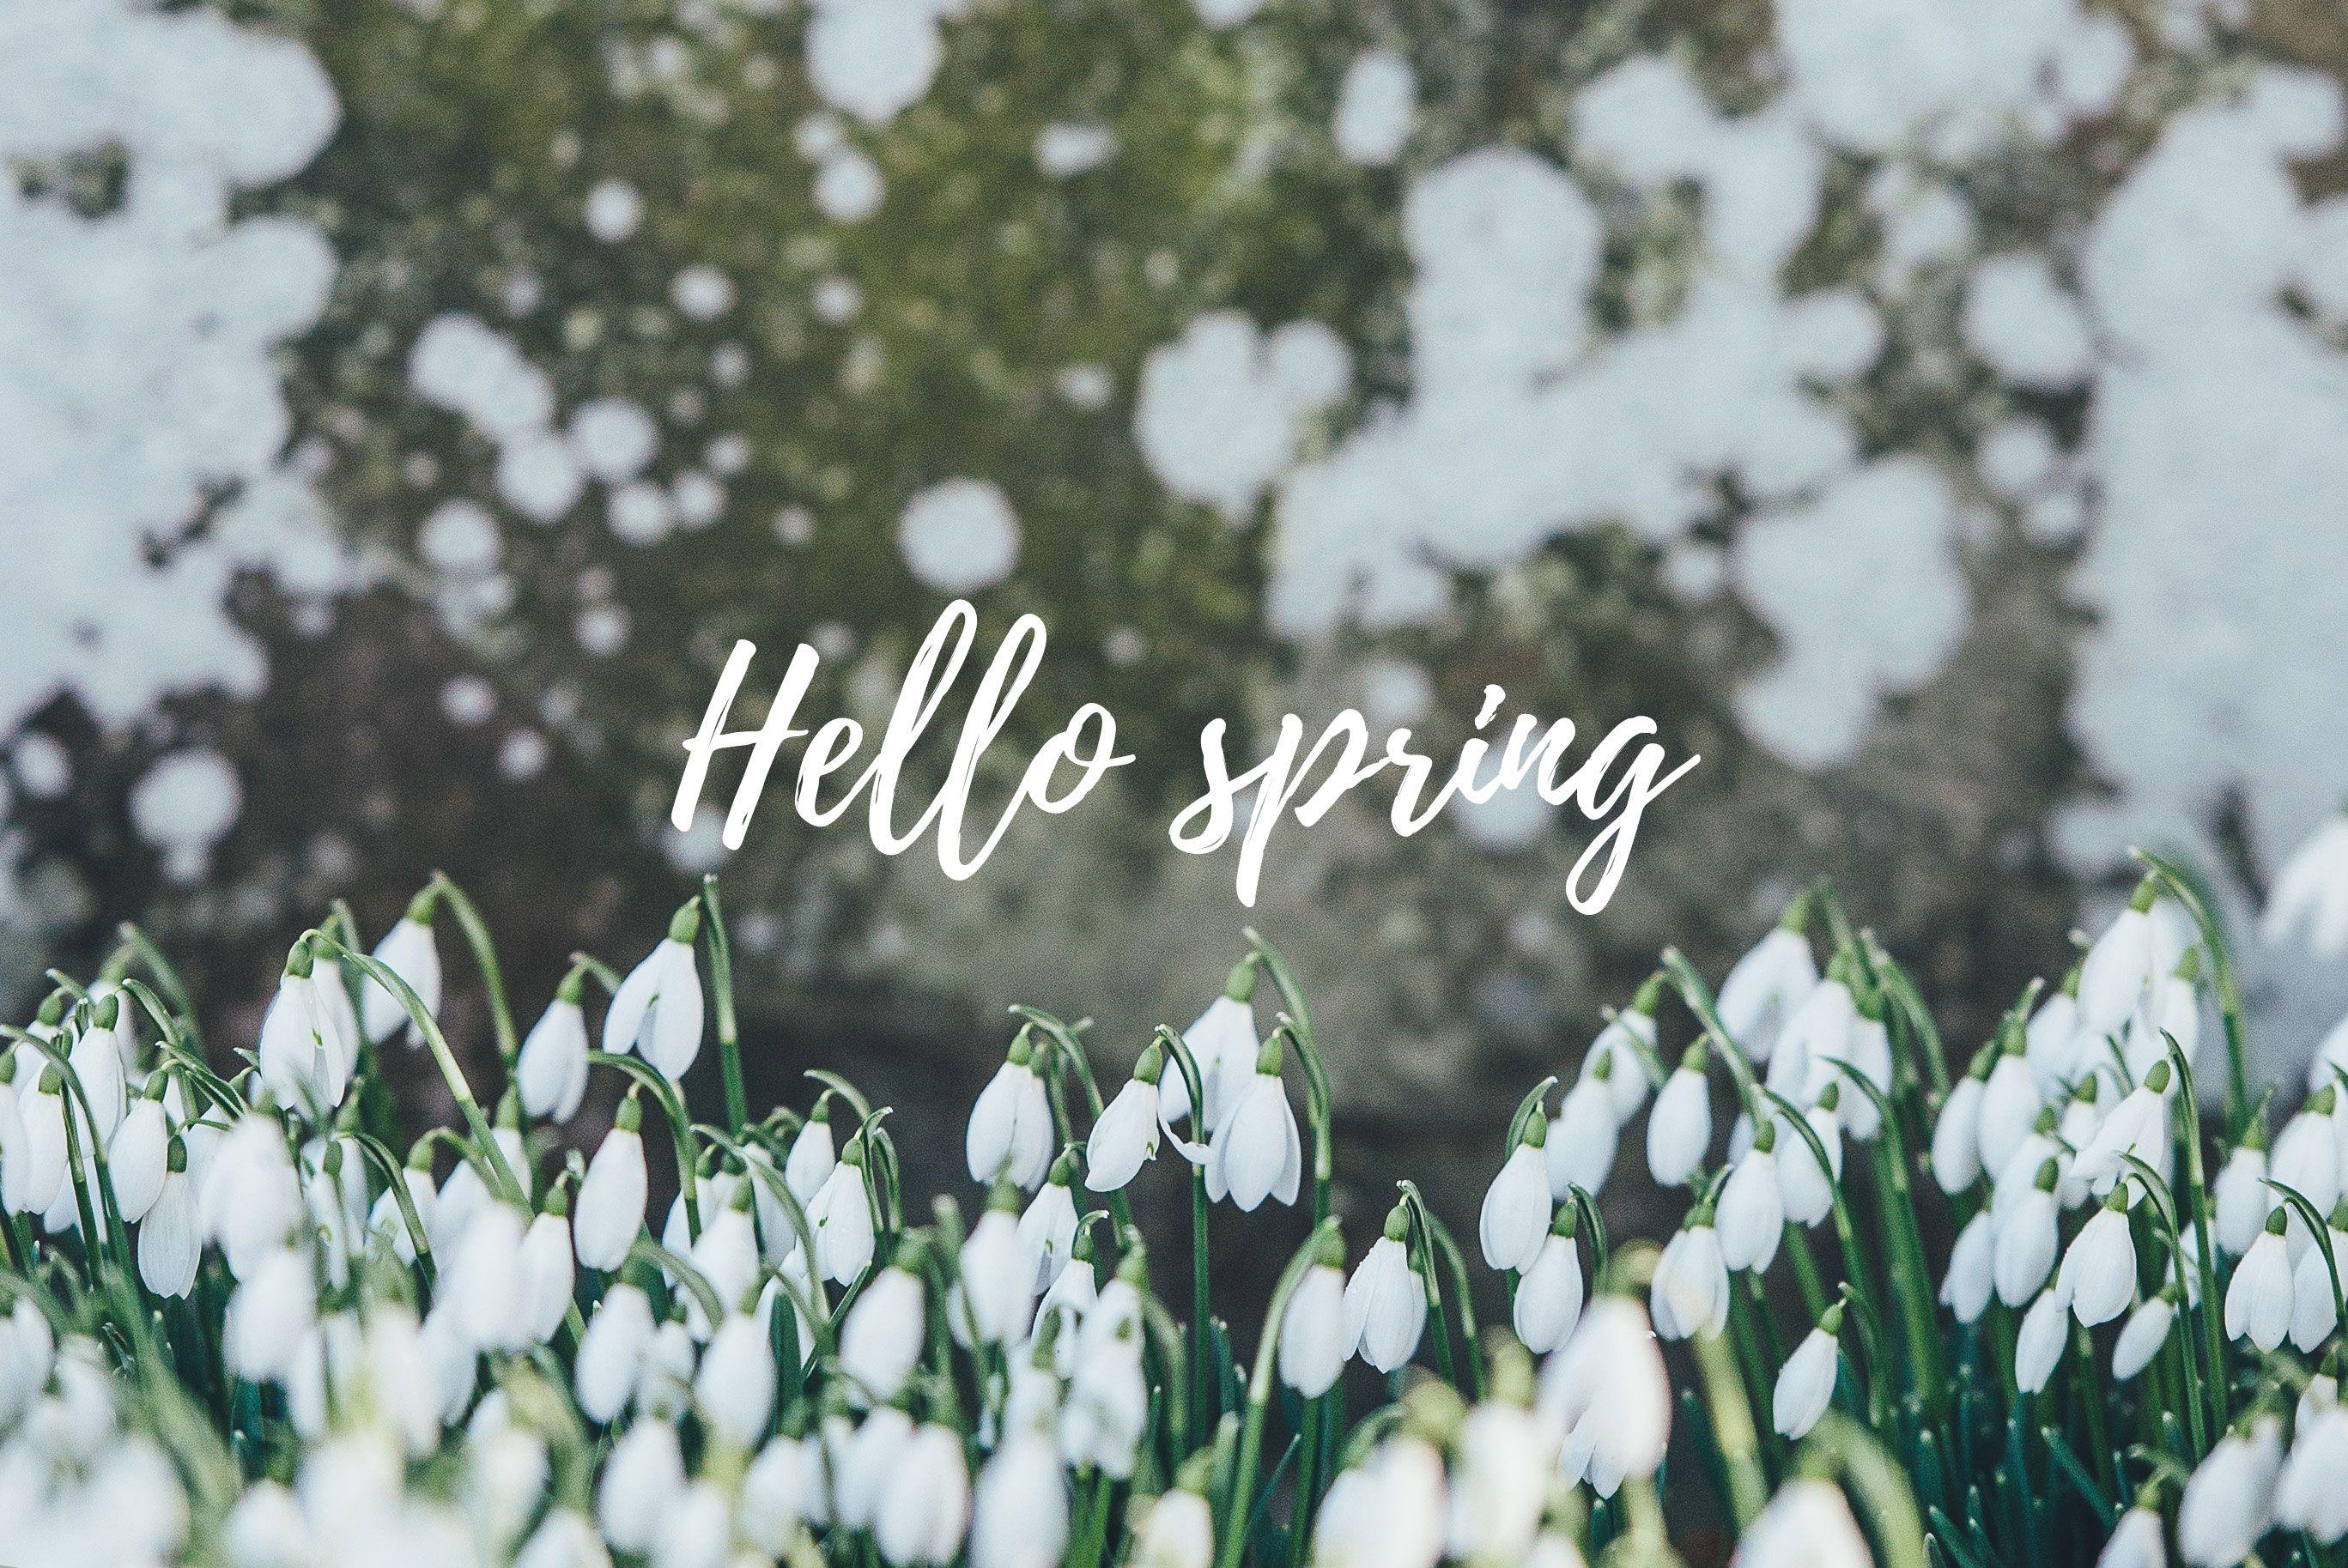 Desktop Aesthetic Spring Wallpapers - Wallpaper Cave